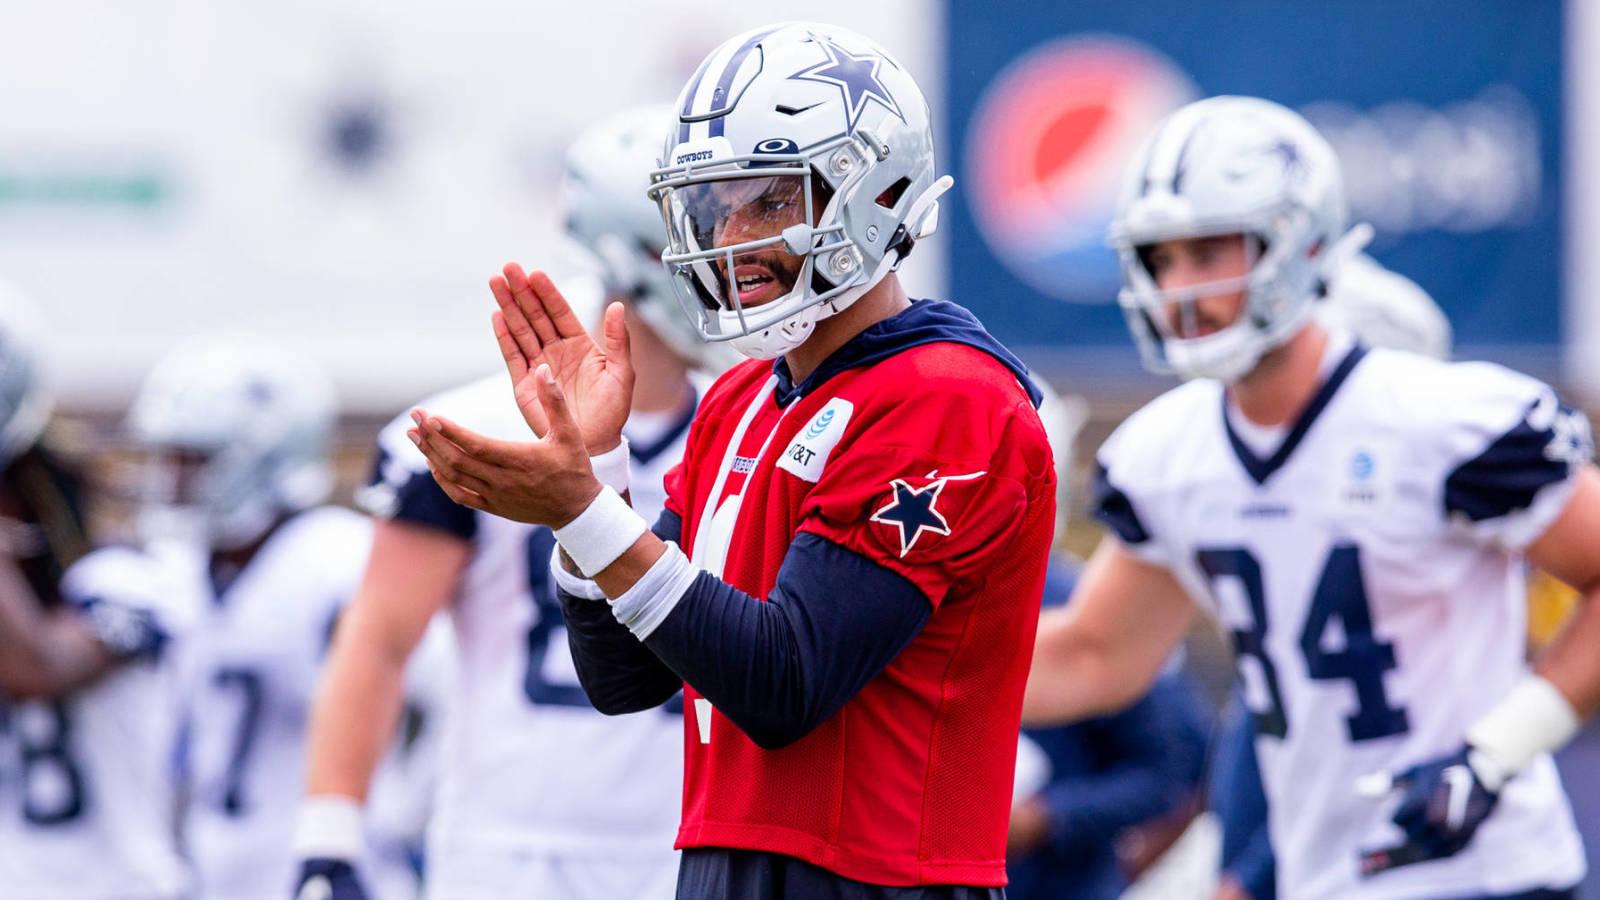 Cowboys hope QB Dak Prescott is ready for Week 1